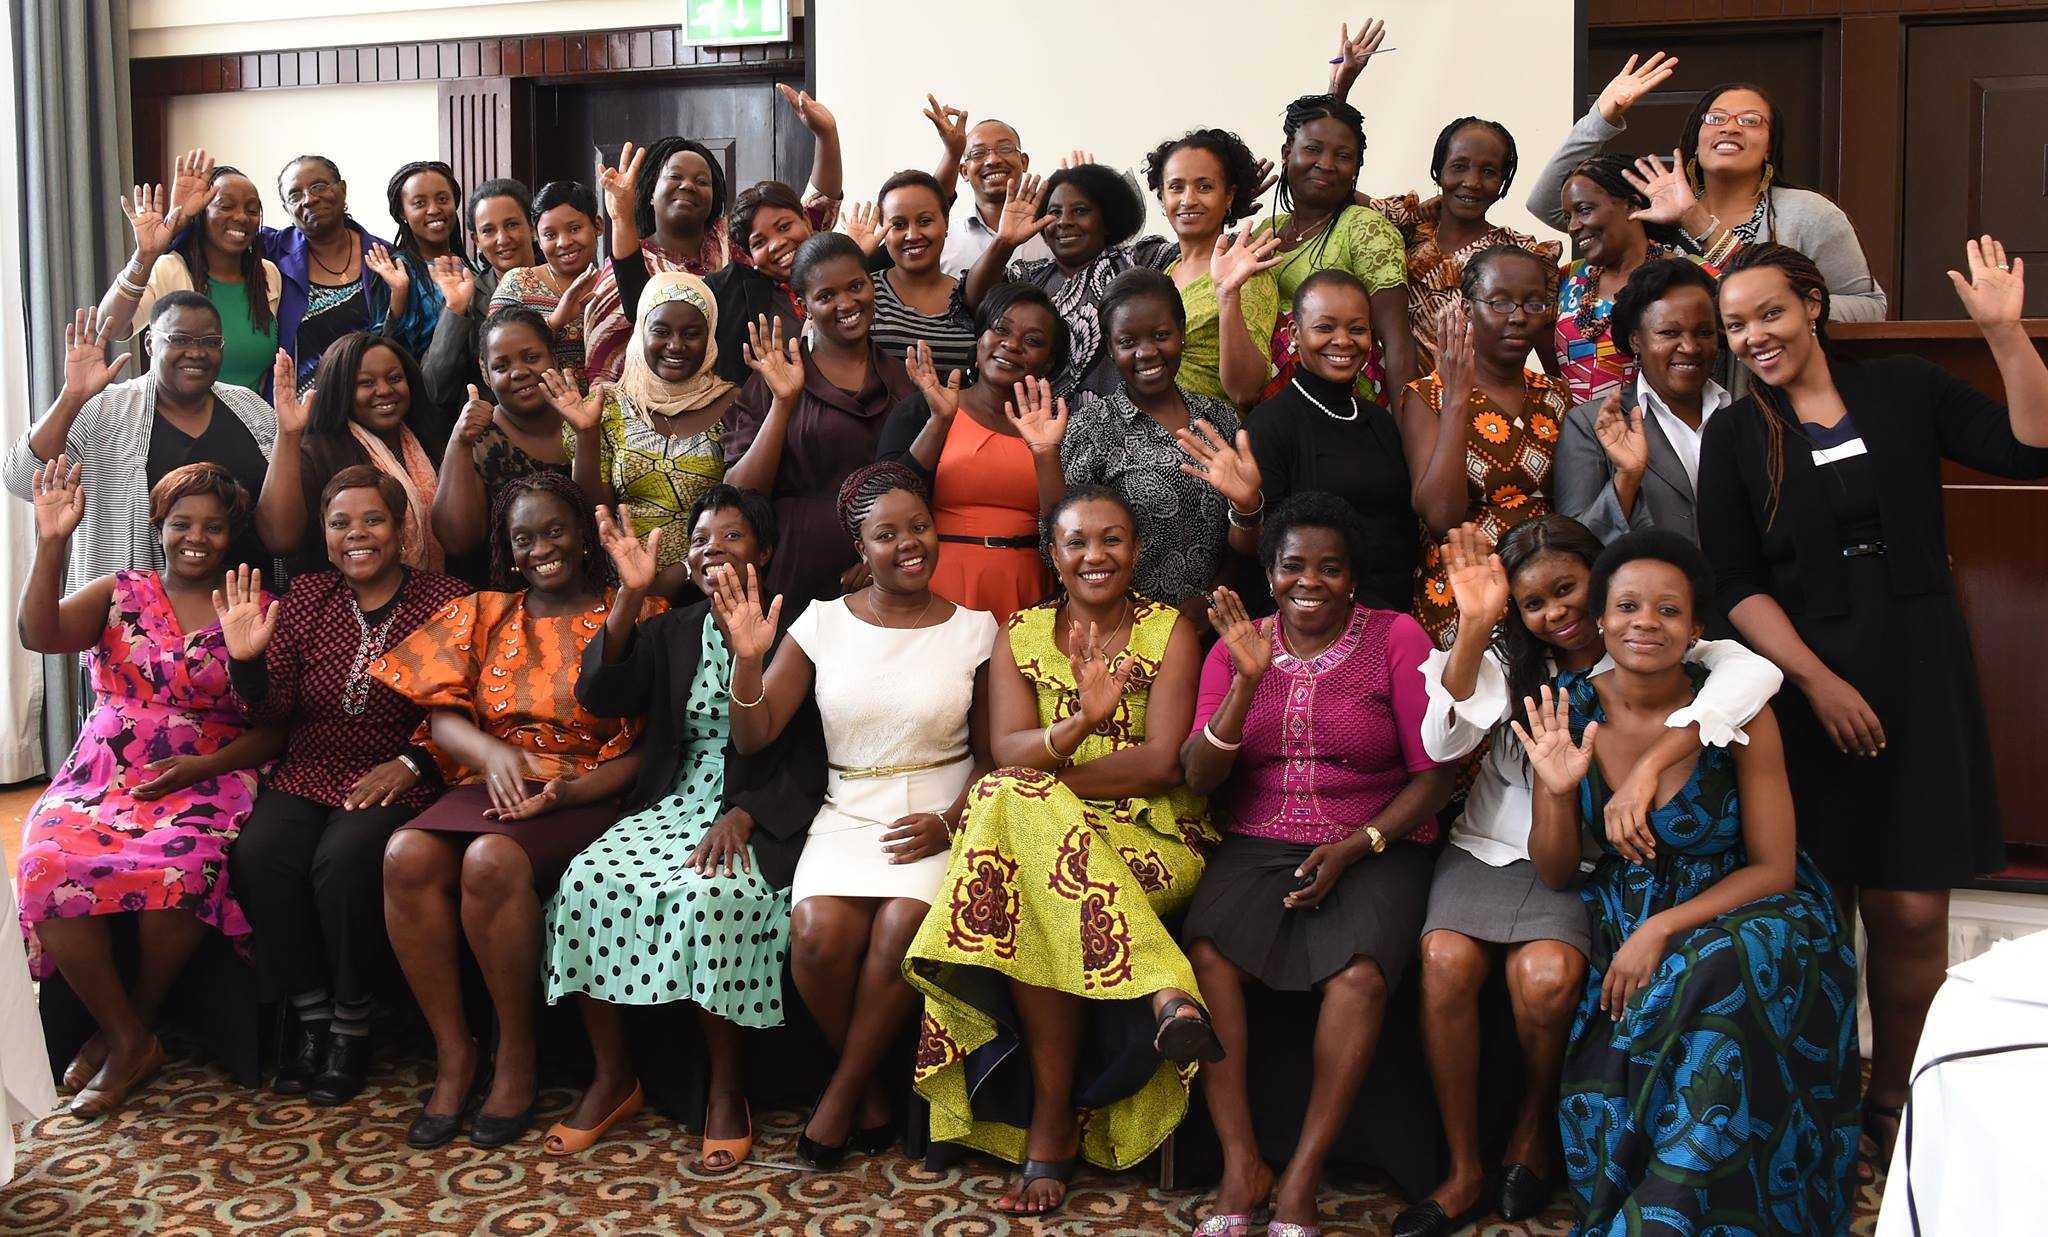 African Ladies first: WOMEN IN AFRICA revient à Marrakech